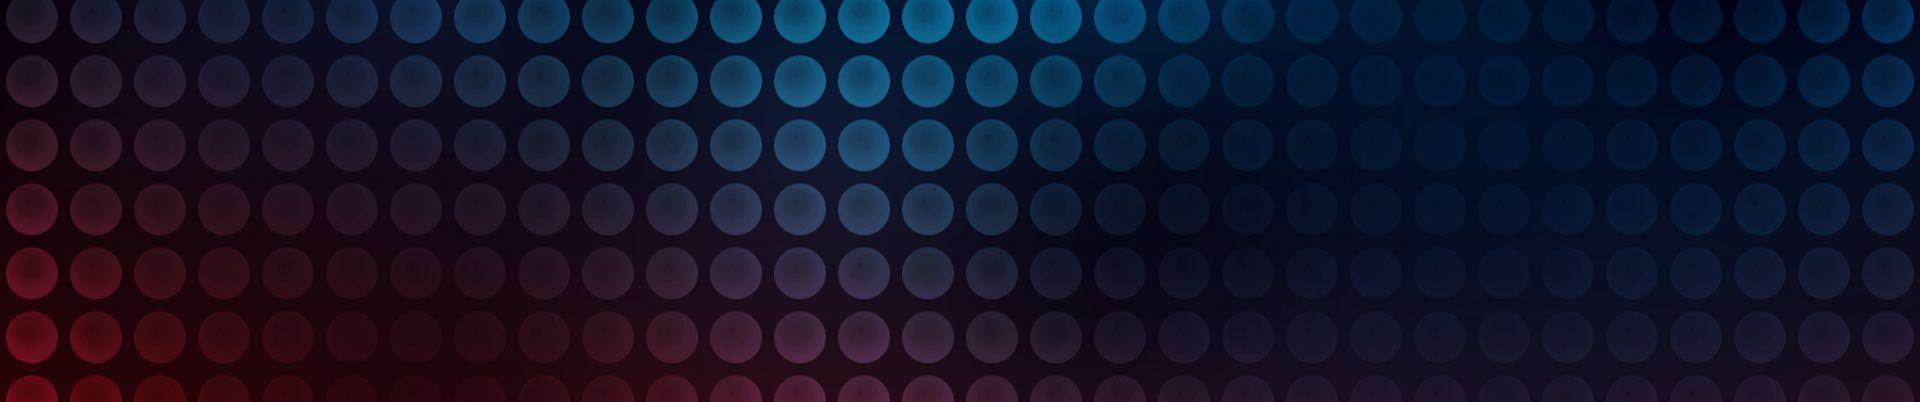 David Guetta Sia V The Proclaimers 500 Miles Anium Dj Jordy Schmolli Pitch Perfect Mashup By Free Listening On Soundcloud